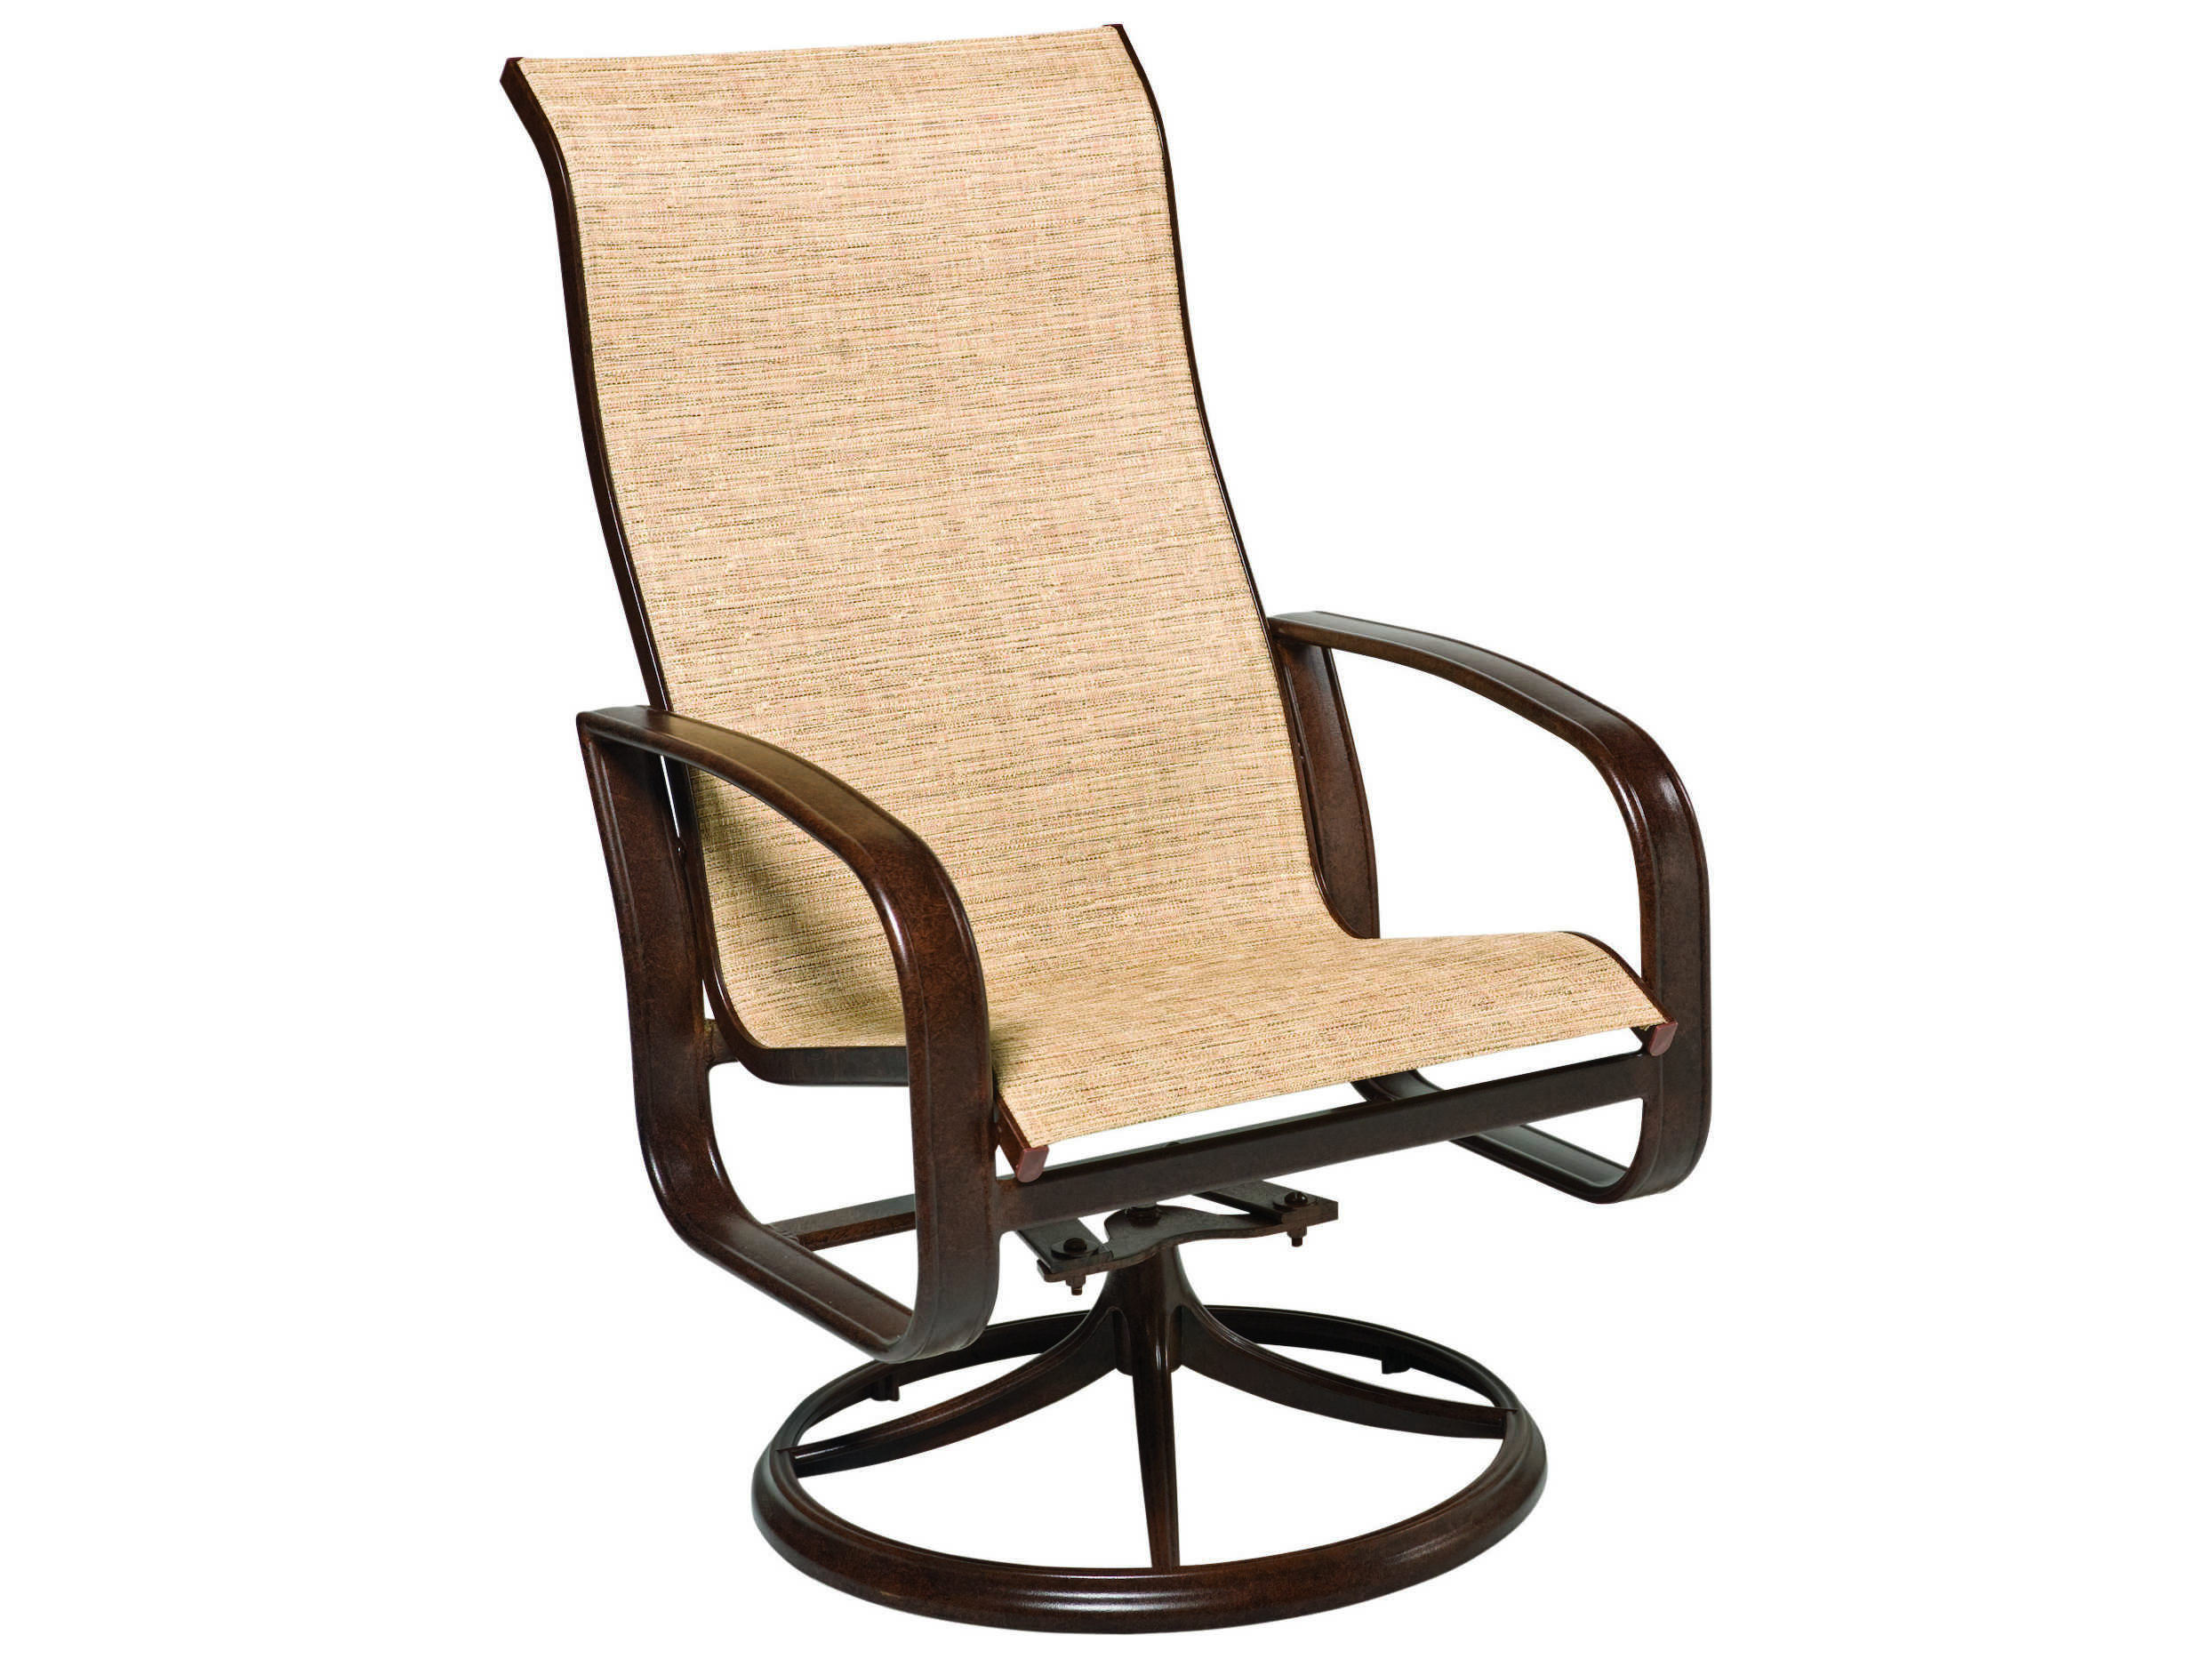 Woodard Cayman Isle Sling Aluminum High Back Swivel Rocker Dining Arm Chair Wr2fx488